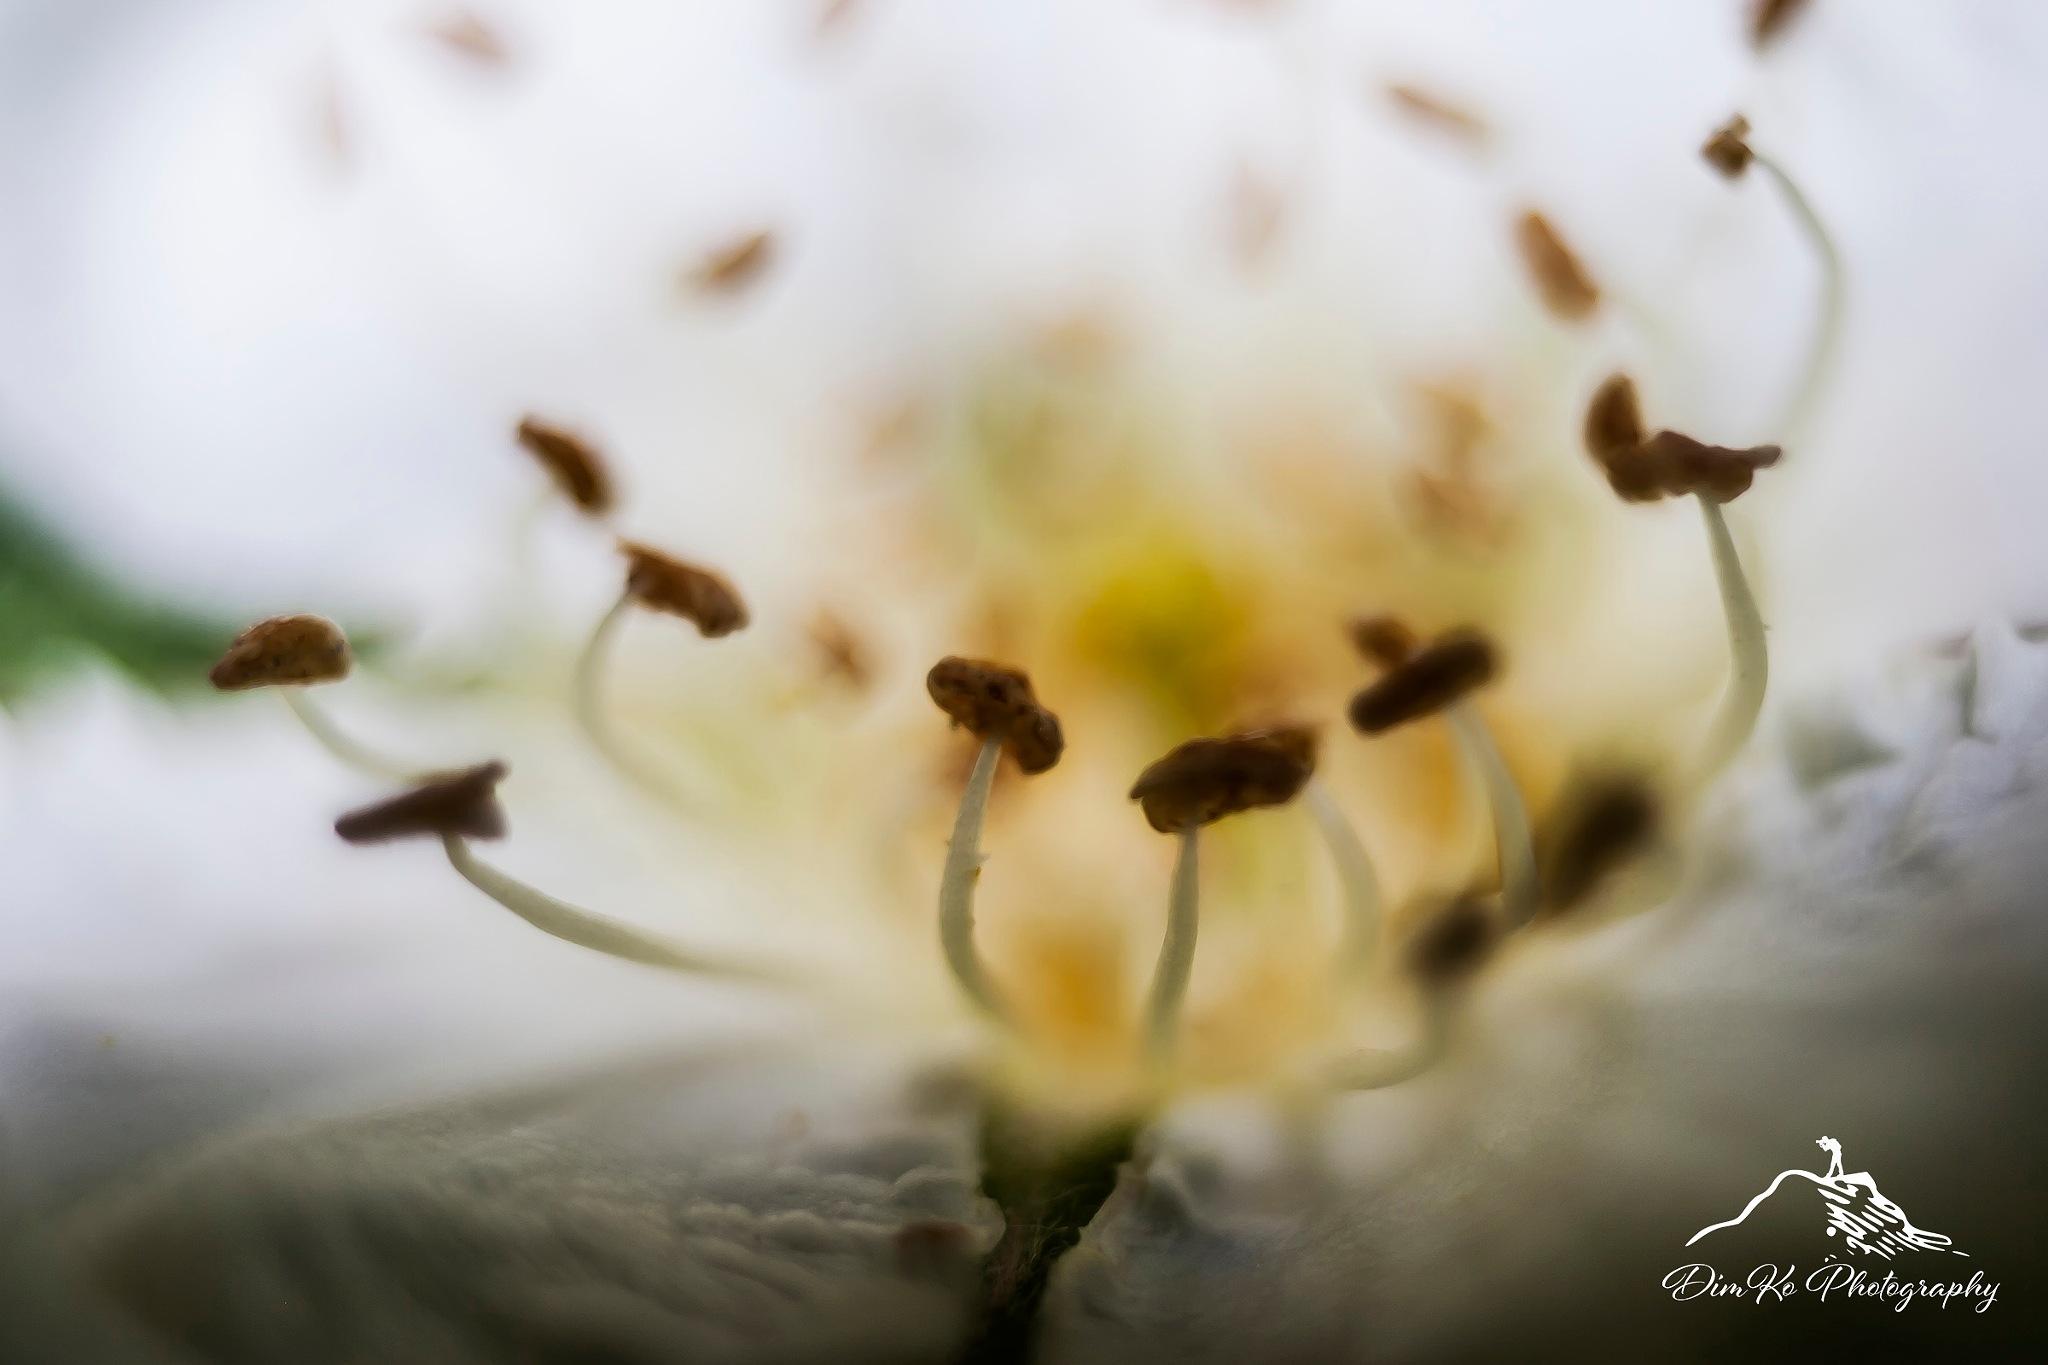 Flower 1 by dimce.korunoski